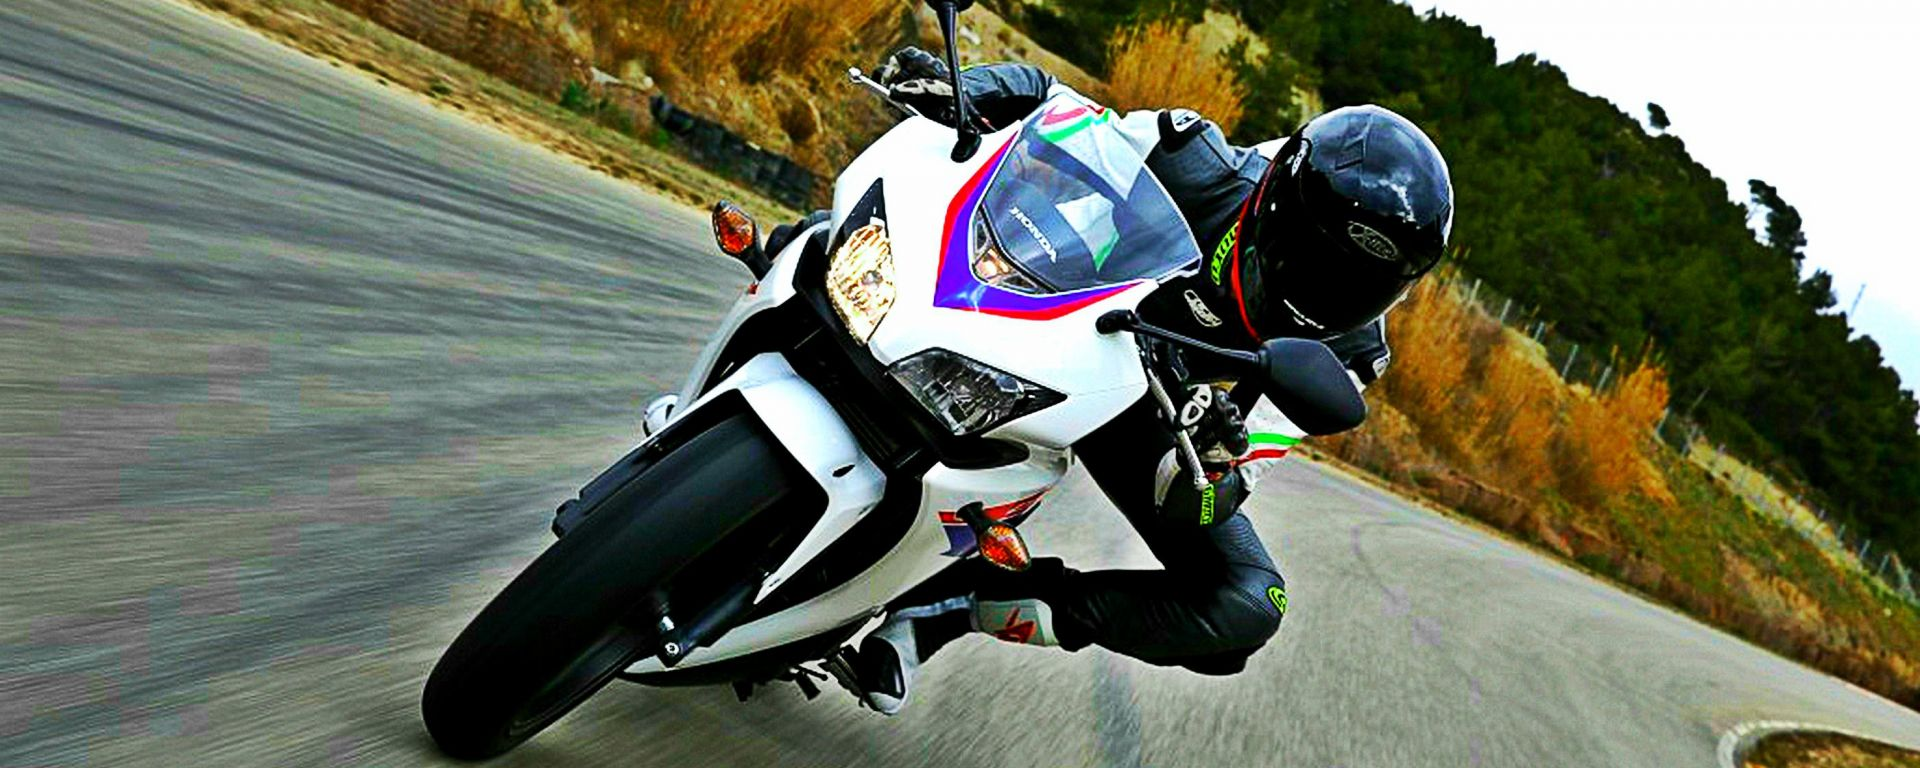 Honda CBR500R e CB500F